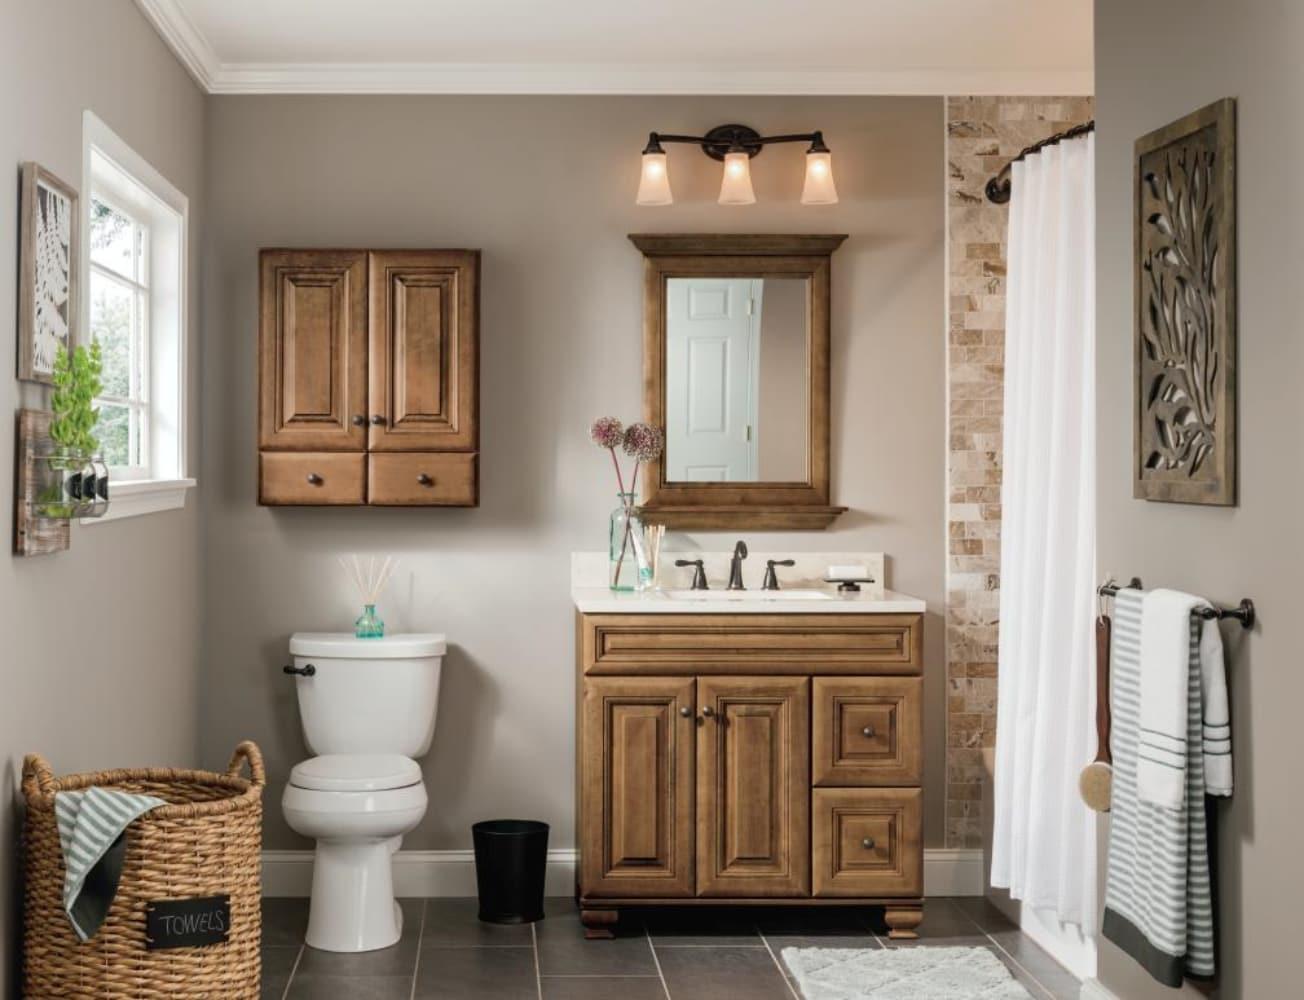 Bathroom Vanities Without Tops, Mocha Bathroom Vanity